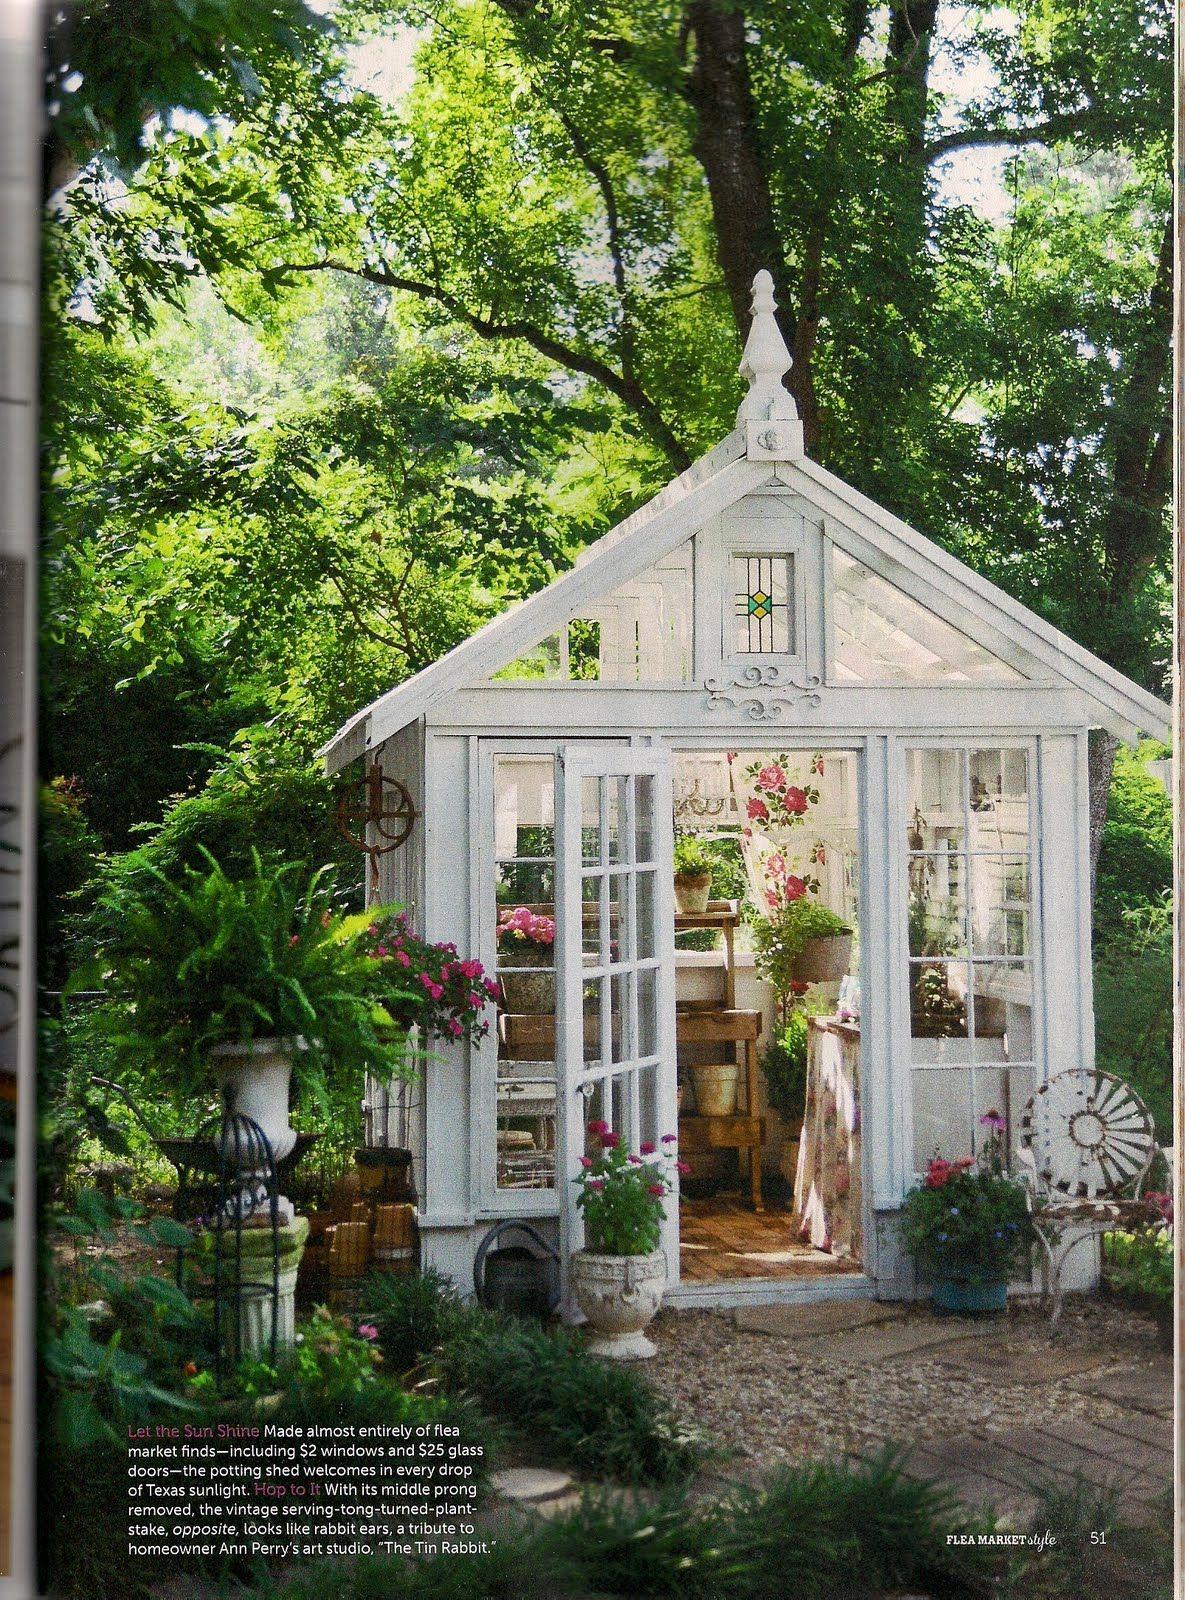 Little garden house - Flea Market Finds This Little Garden Oasis Was Built From Inexpensive Flea Market Finds Like 2